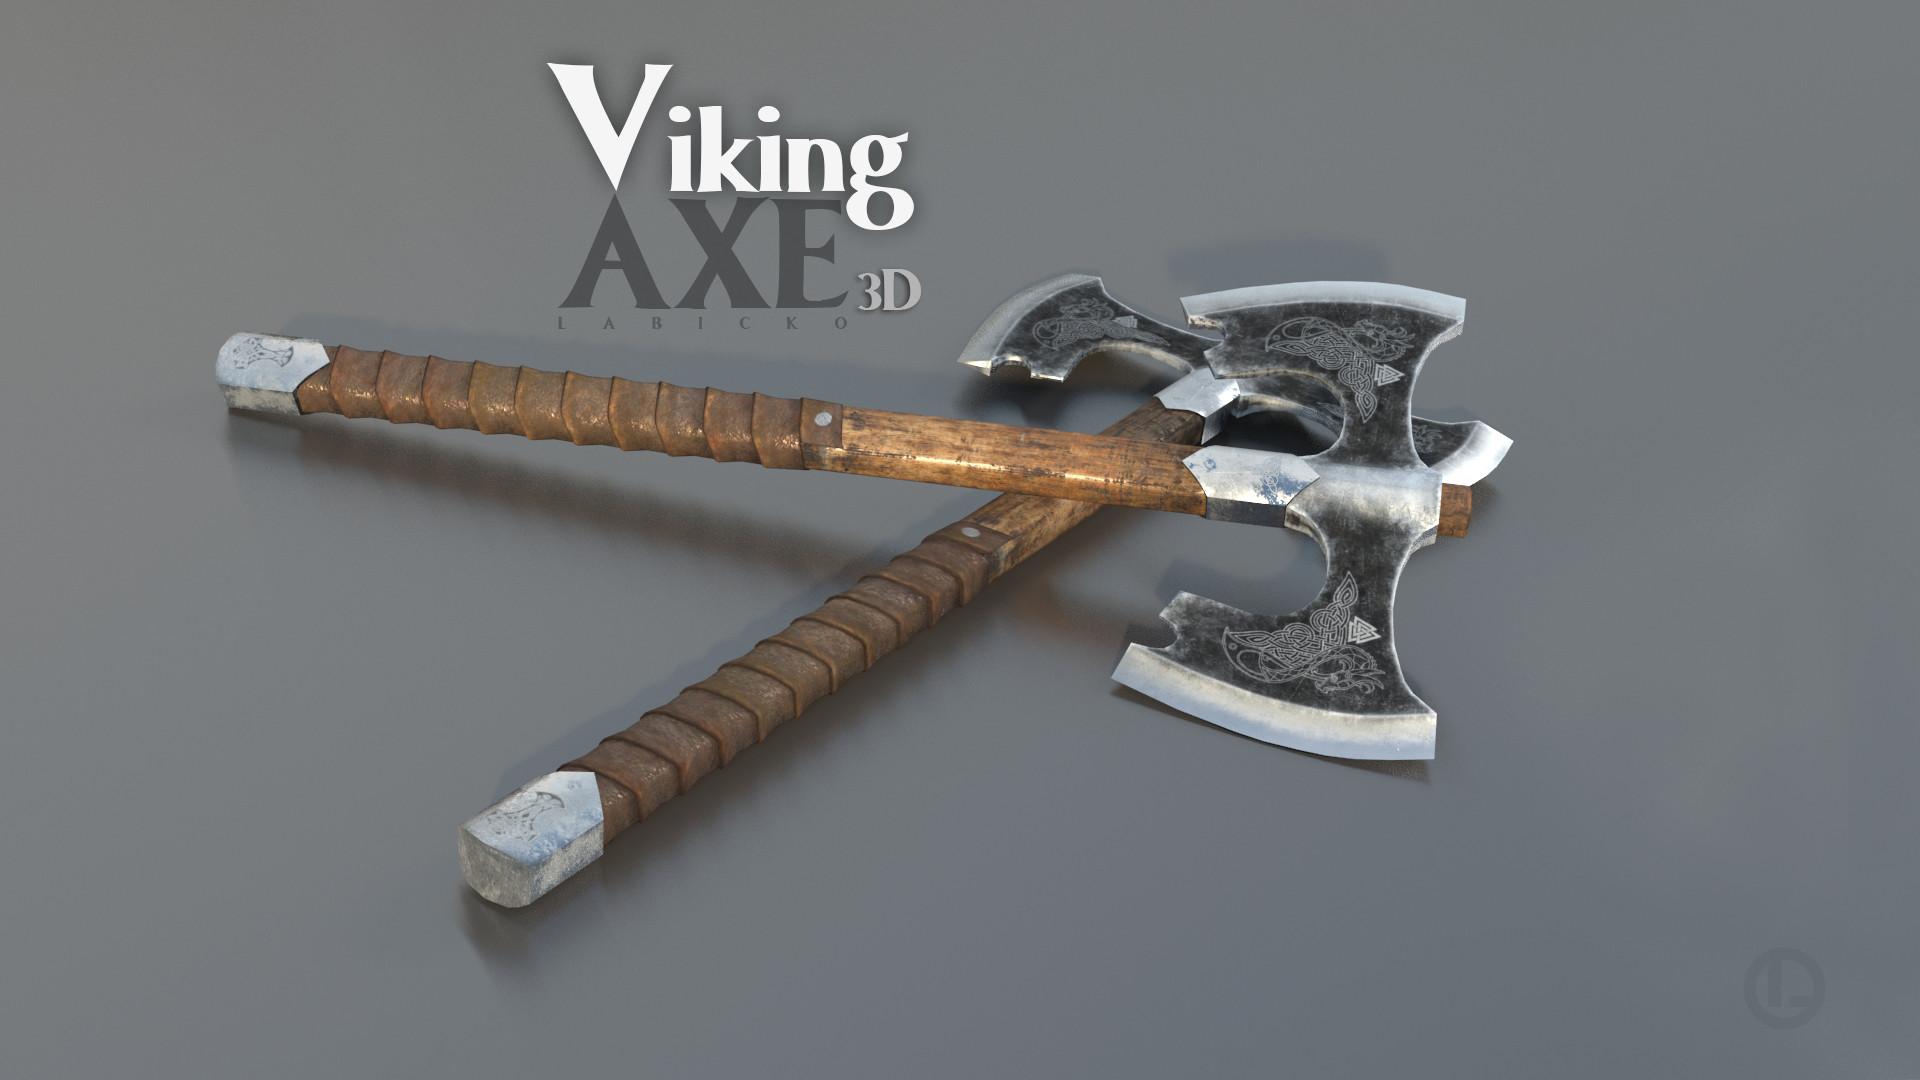 dejan-labicic-3d-viking-axe-3.jpg